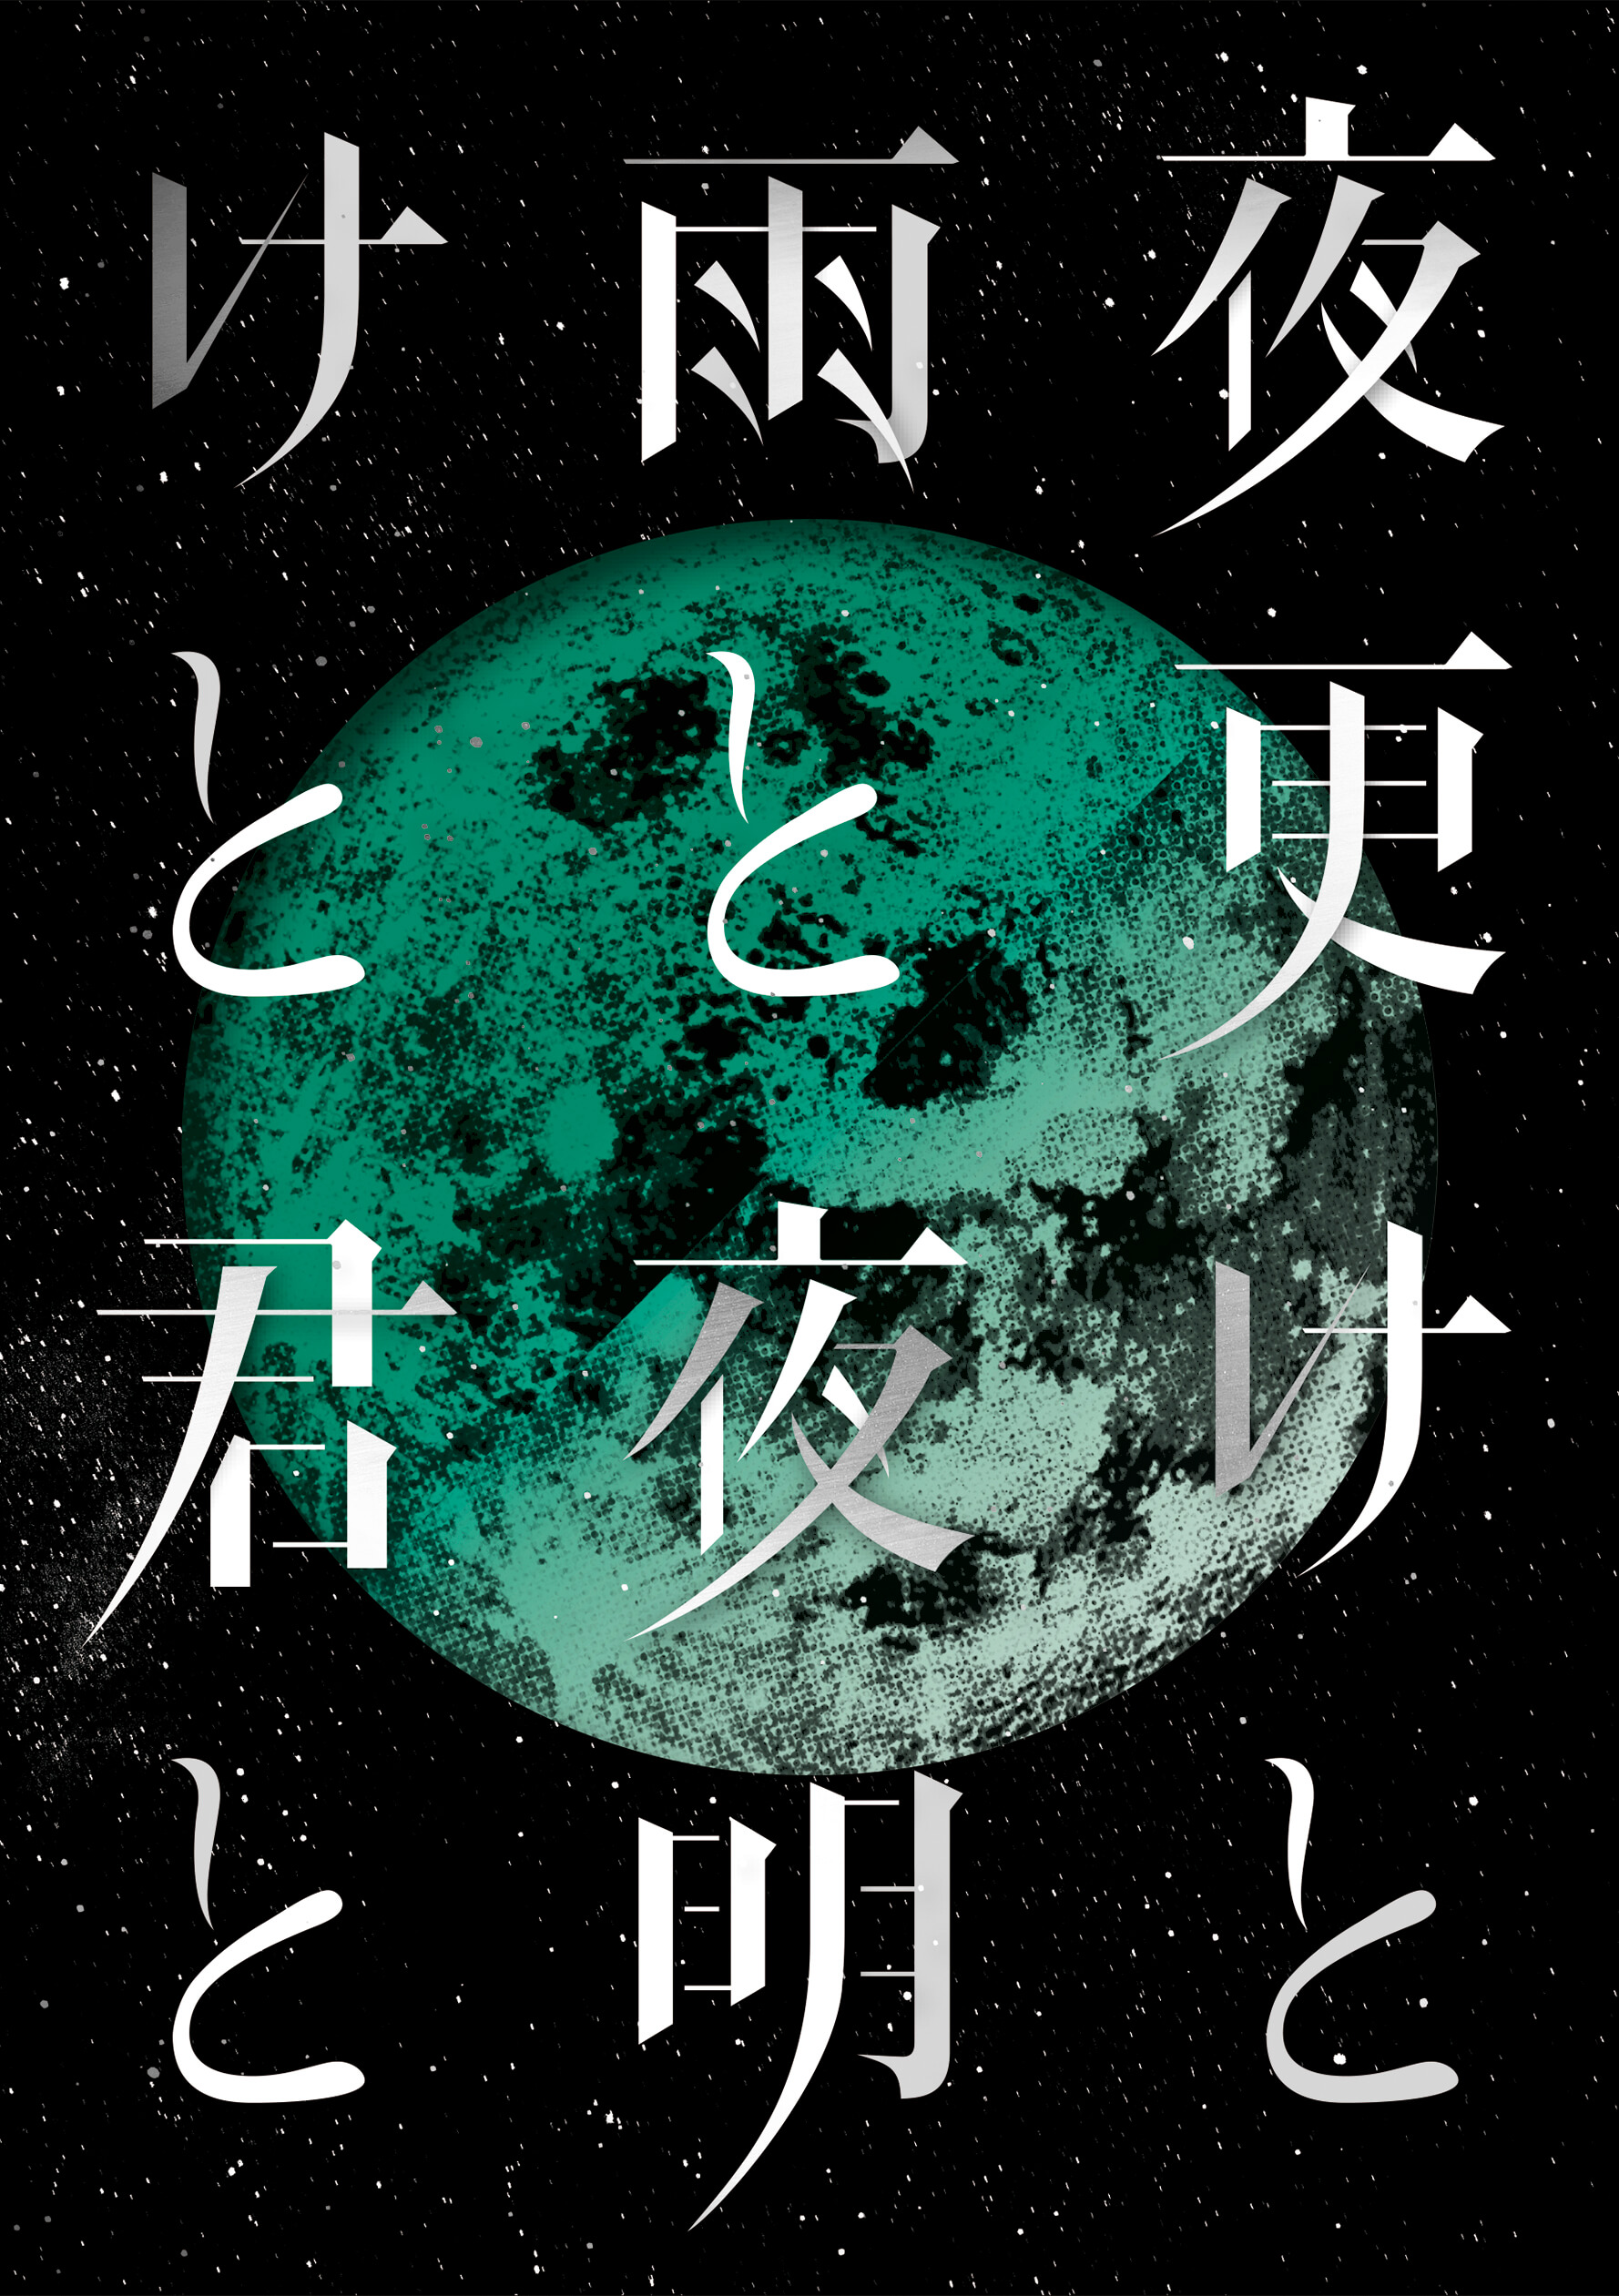 sid_budokan_syokai_jk01